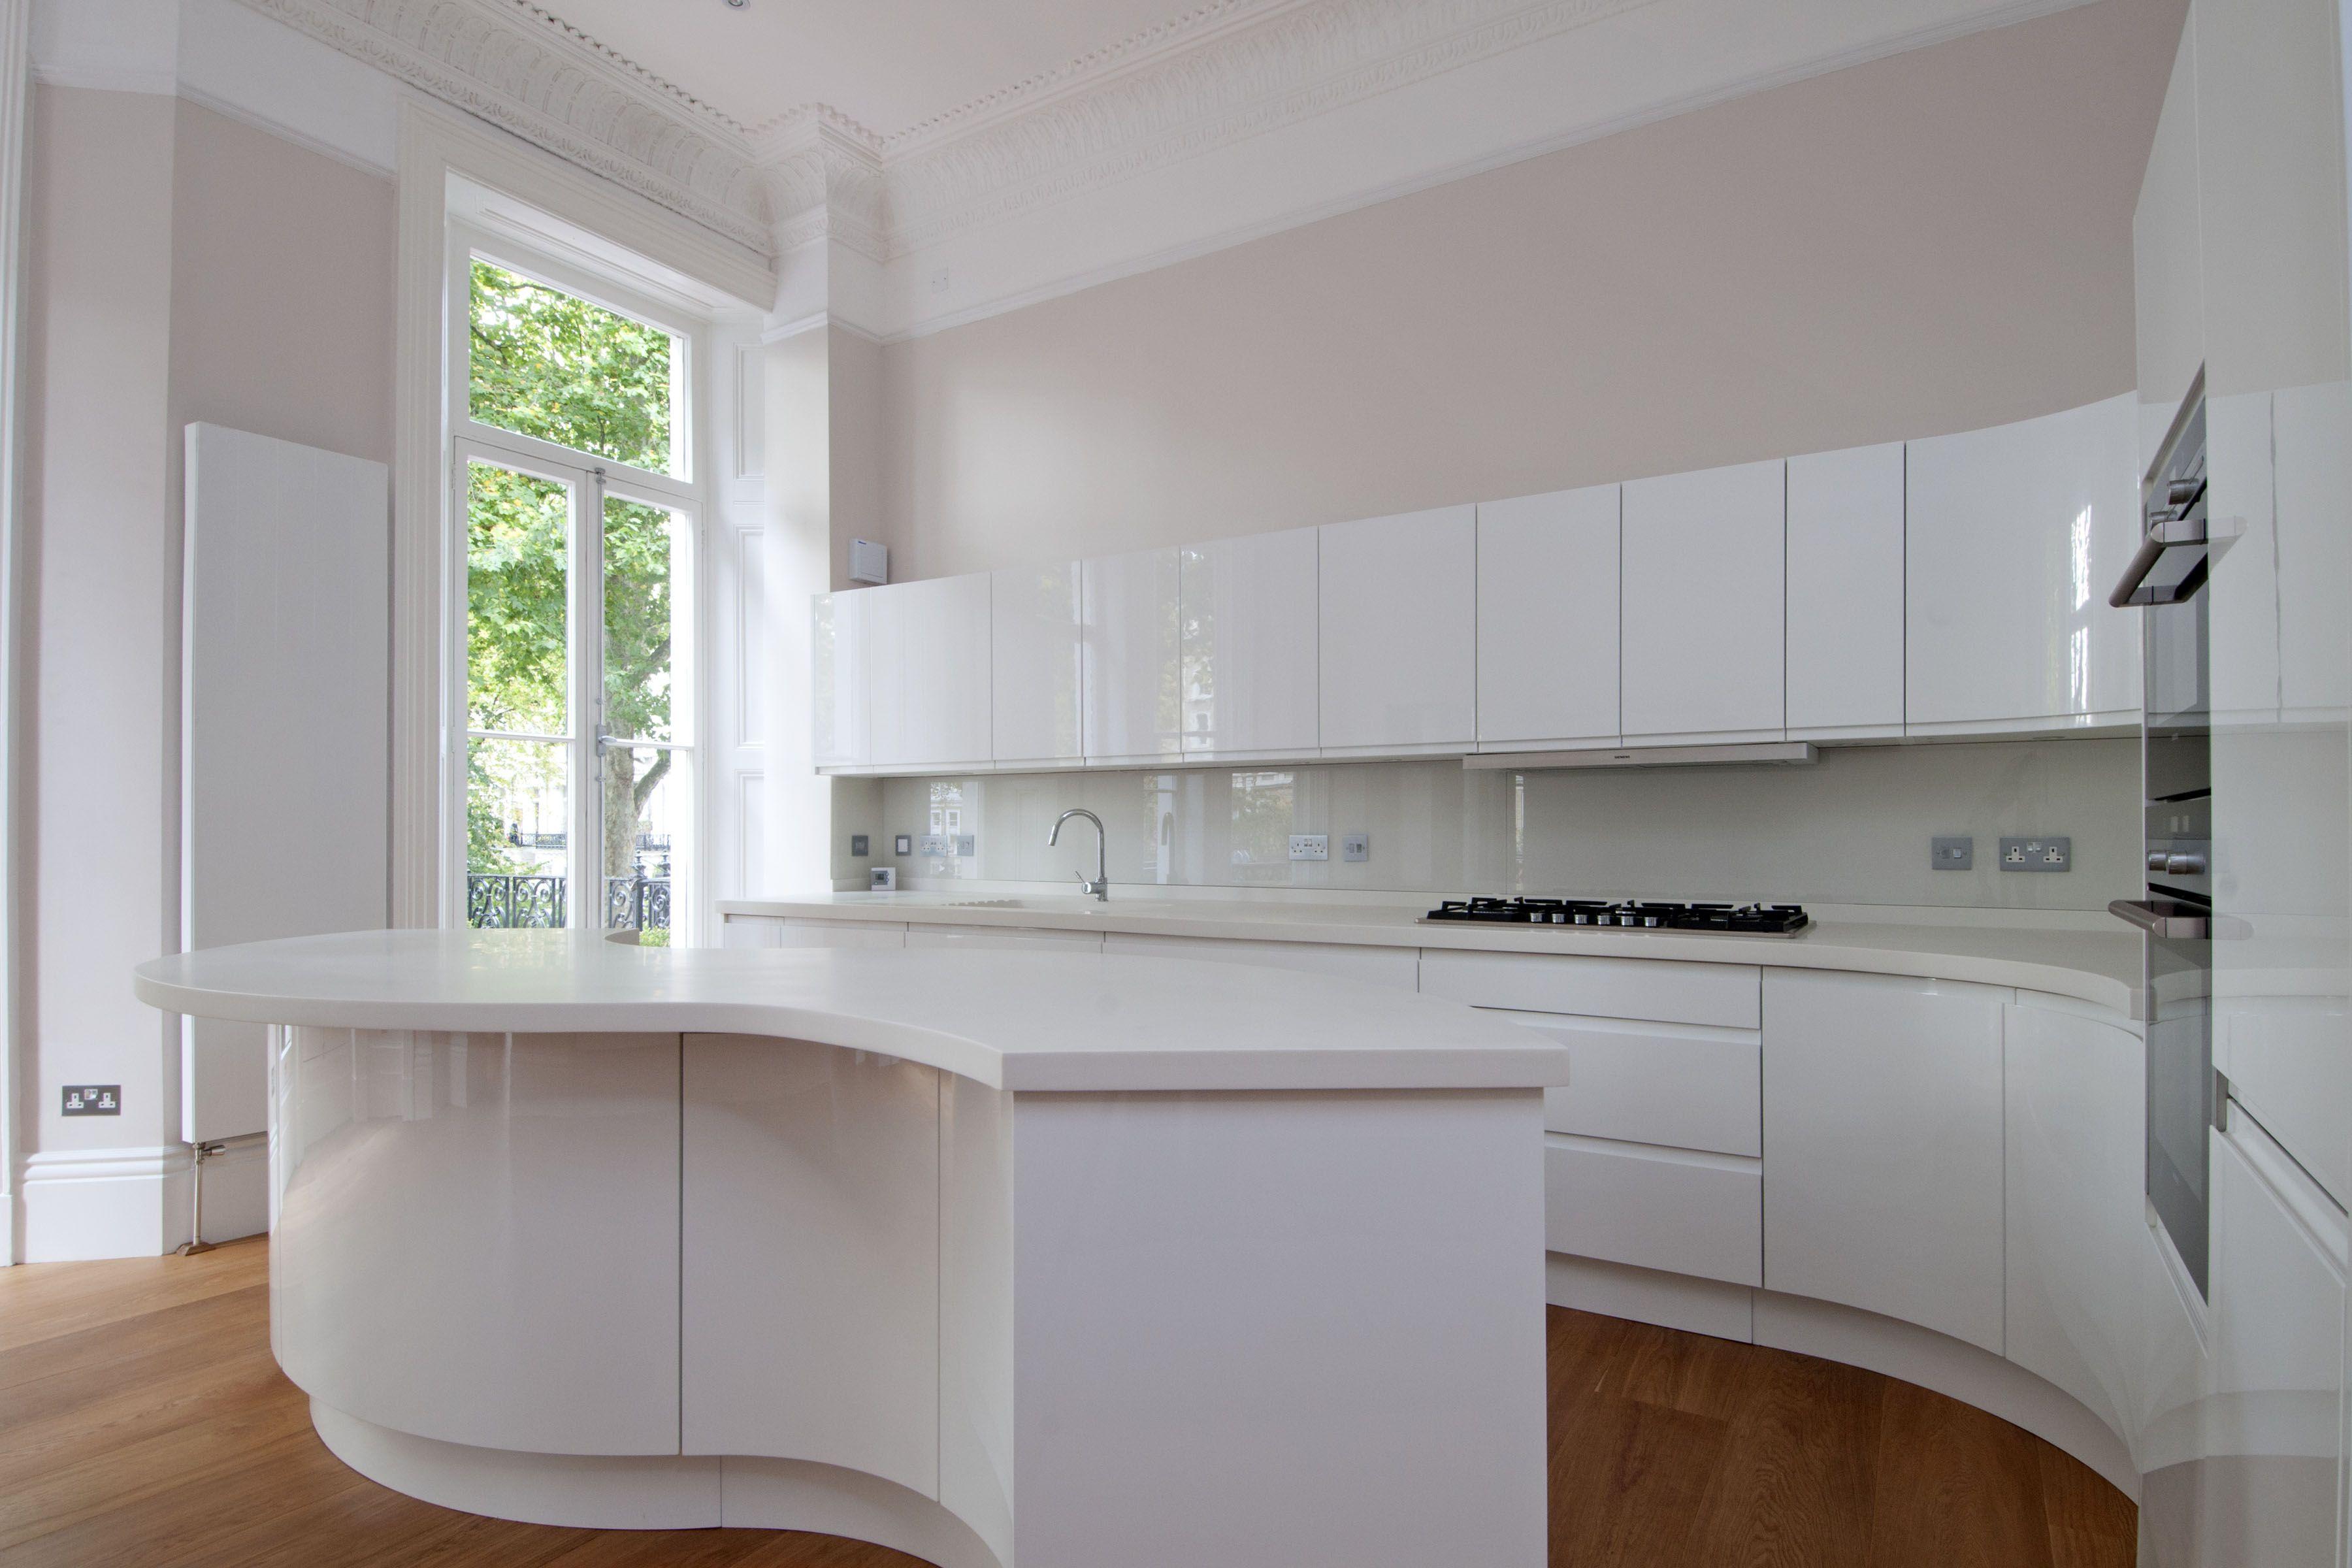 High Gloss Handleless Kitchen With S Shaped Island Corian Worktop Nice Ideas